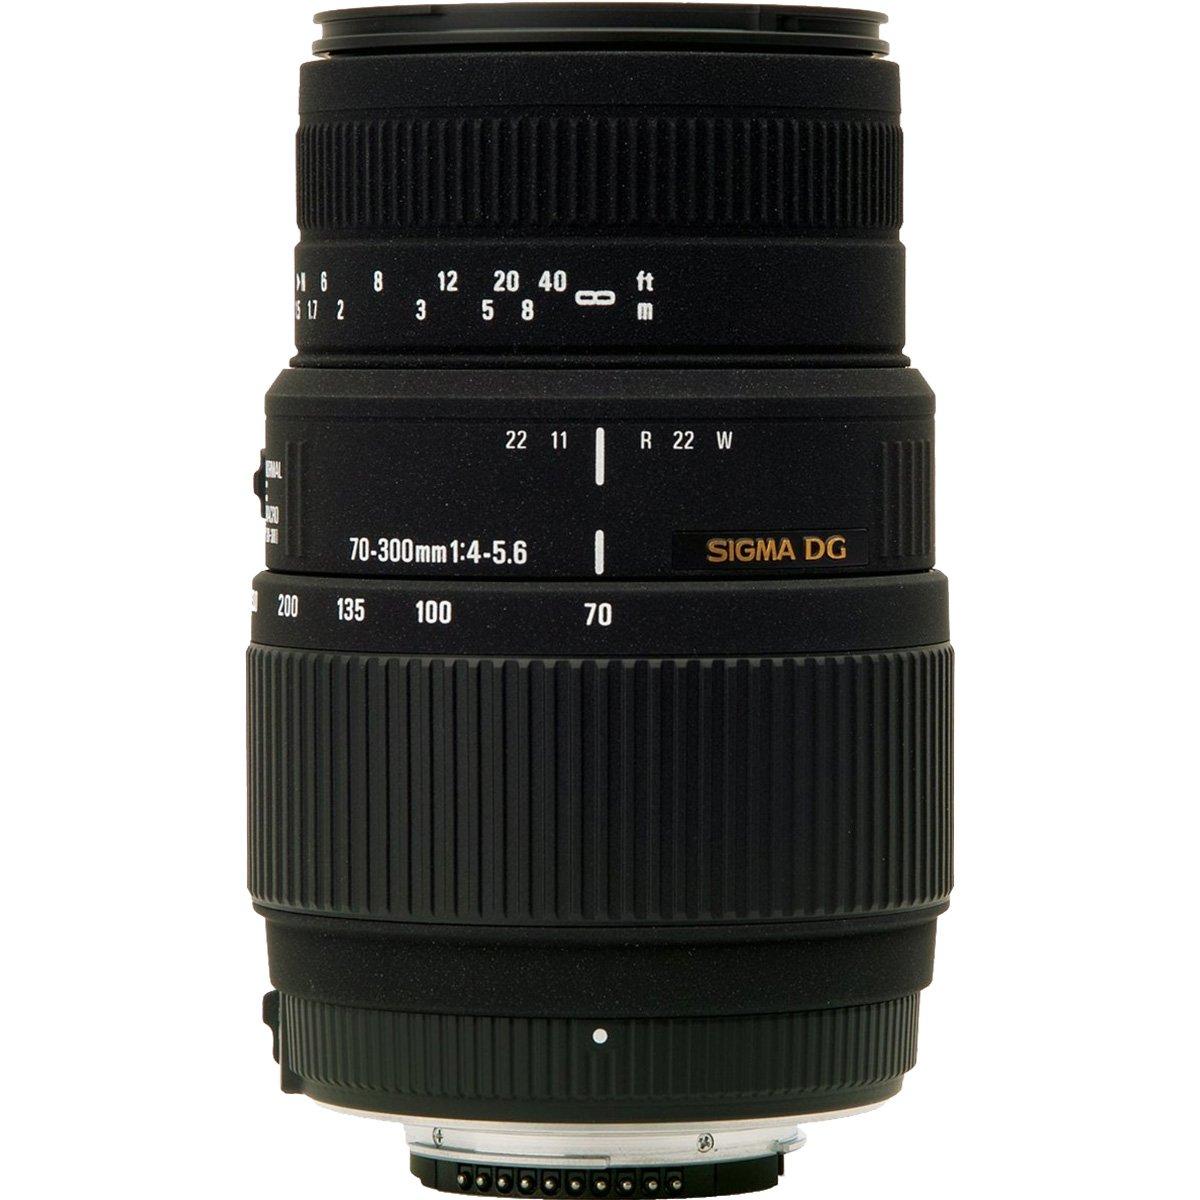 Sigma 70-300mm f/4-5.6 DG Motorized Macro Zoom Lens with Tripod + Filter + Strap + Kit for Nikon Digital SLR Cameras by Sigma (Image #3)